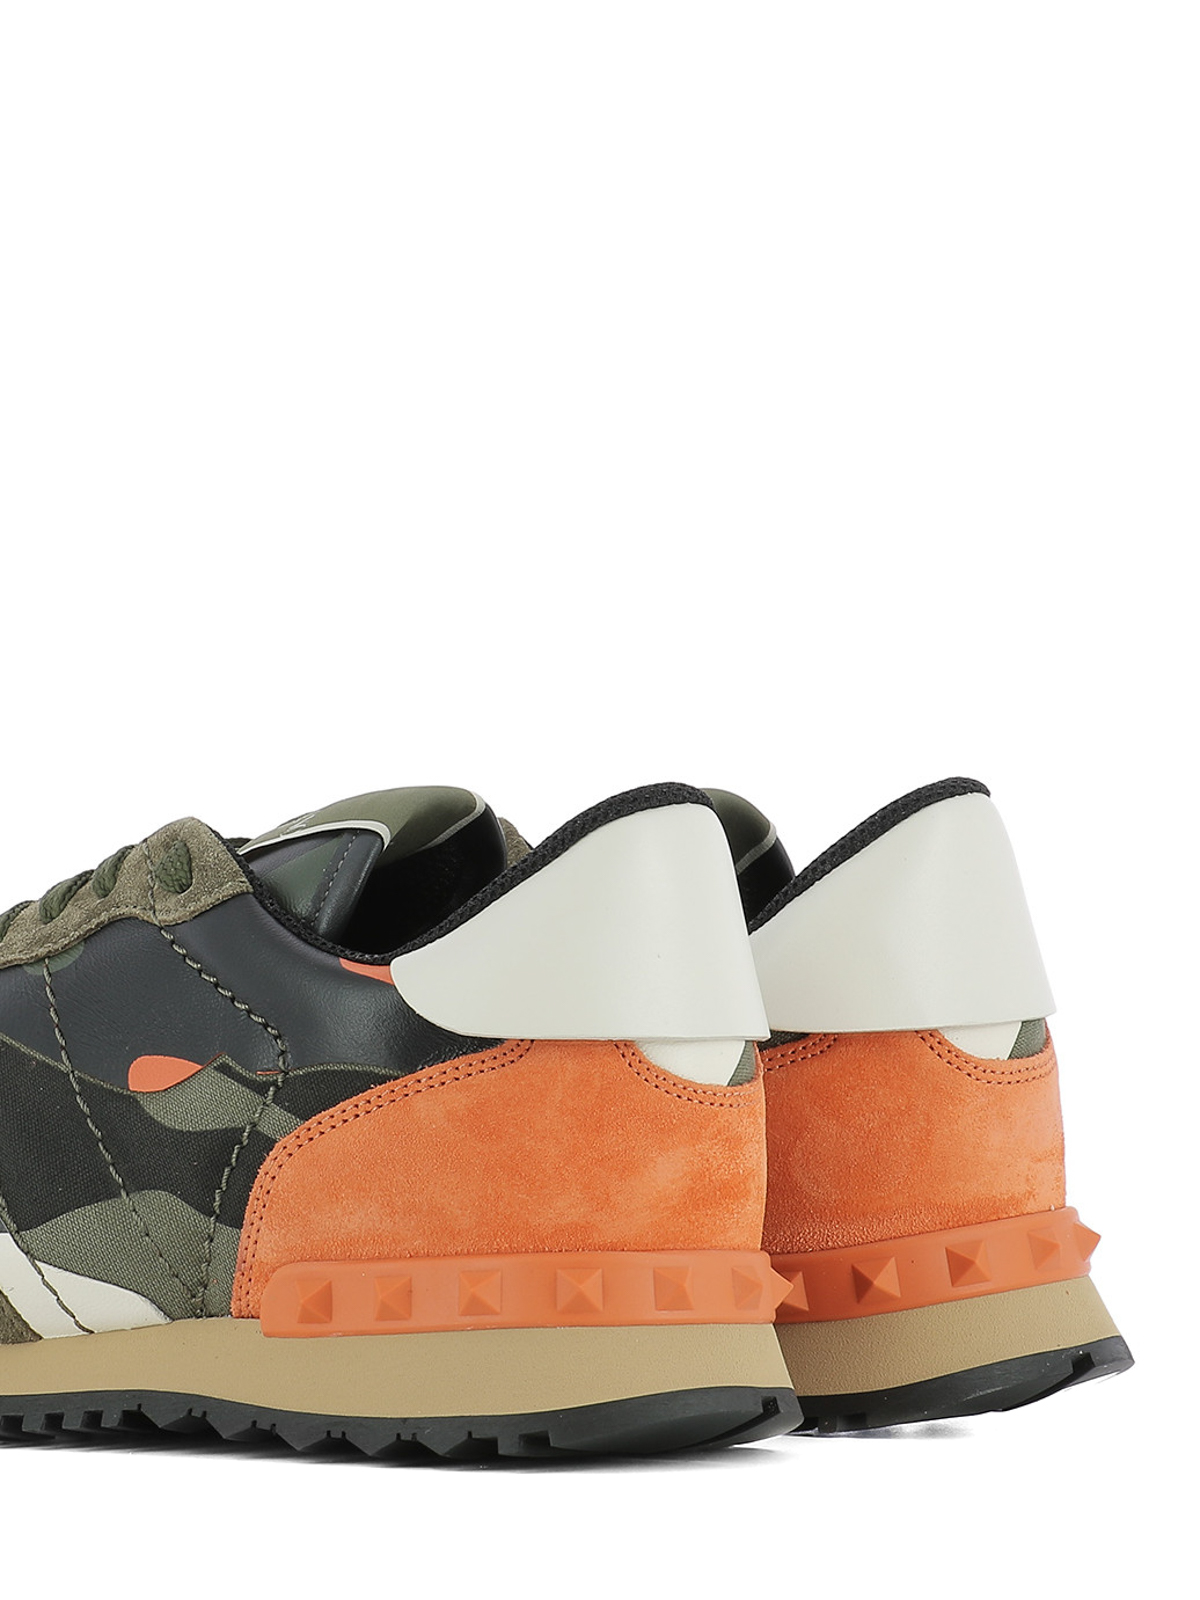 Valentino Sneakers Garavani Camouflage Rockrunner Trainers DH29EI